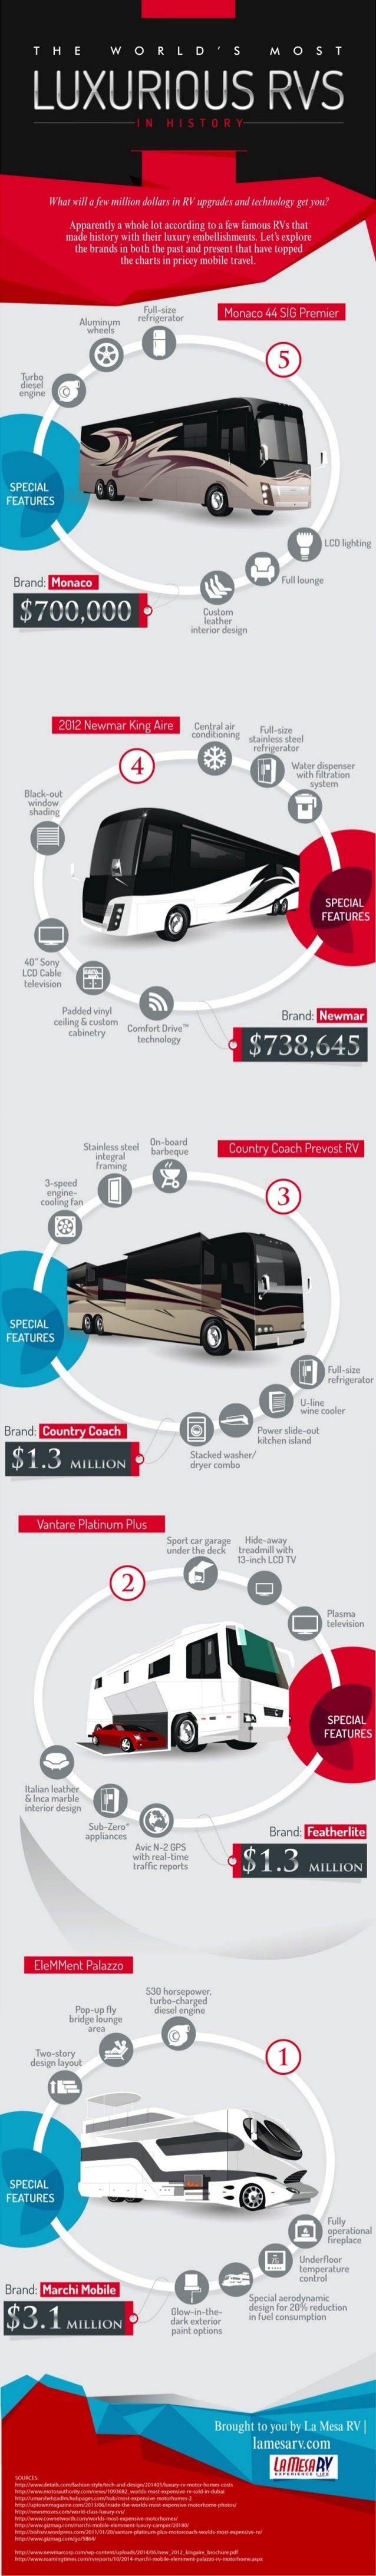 Most Expensive RV's | Luxury RV | La Mesa RV